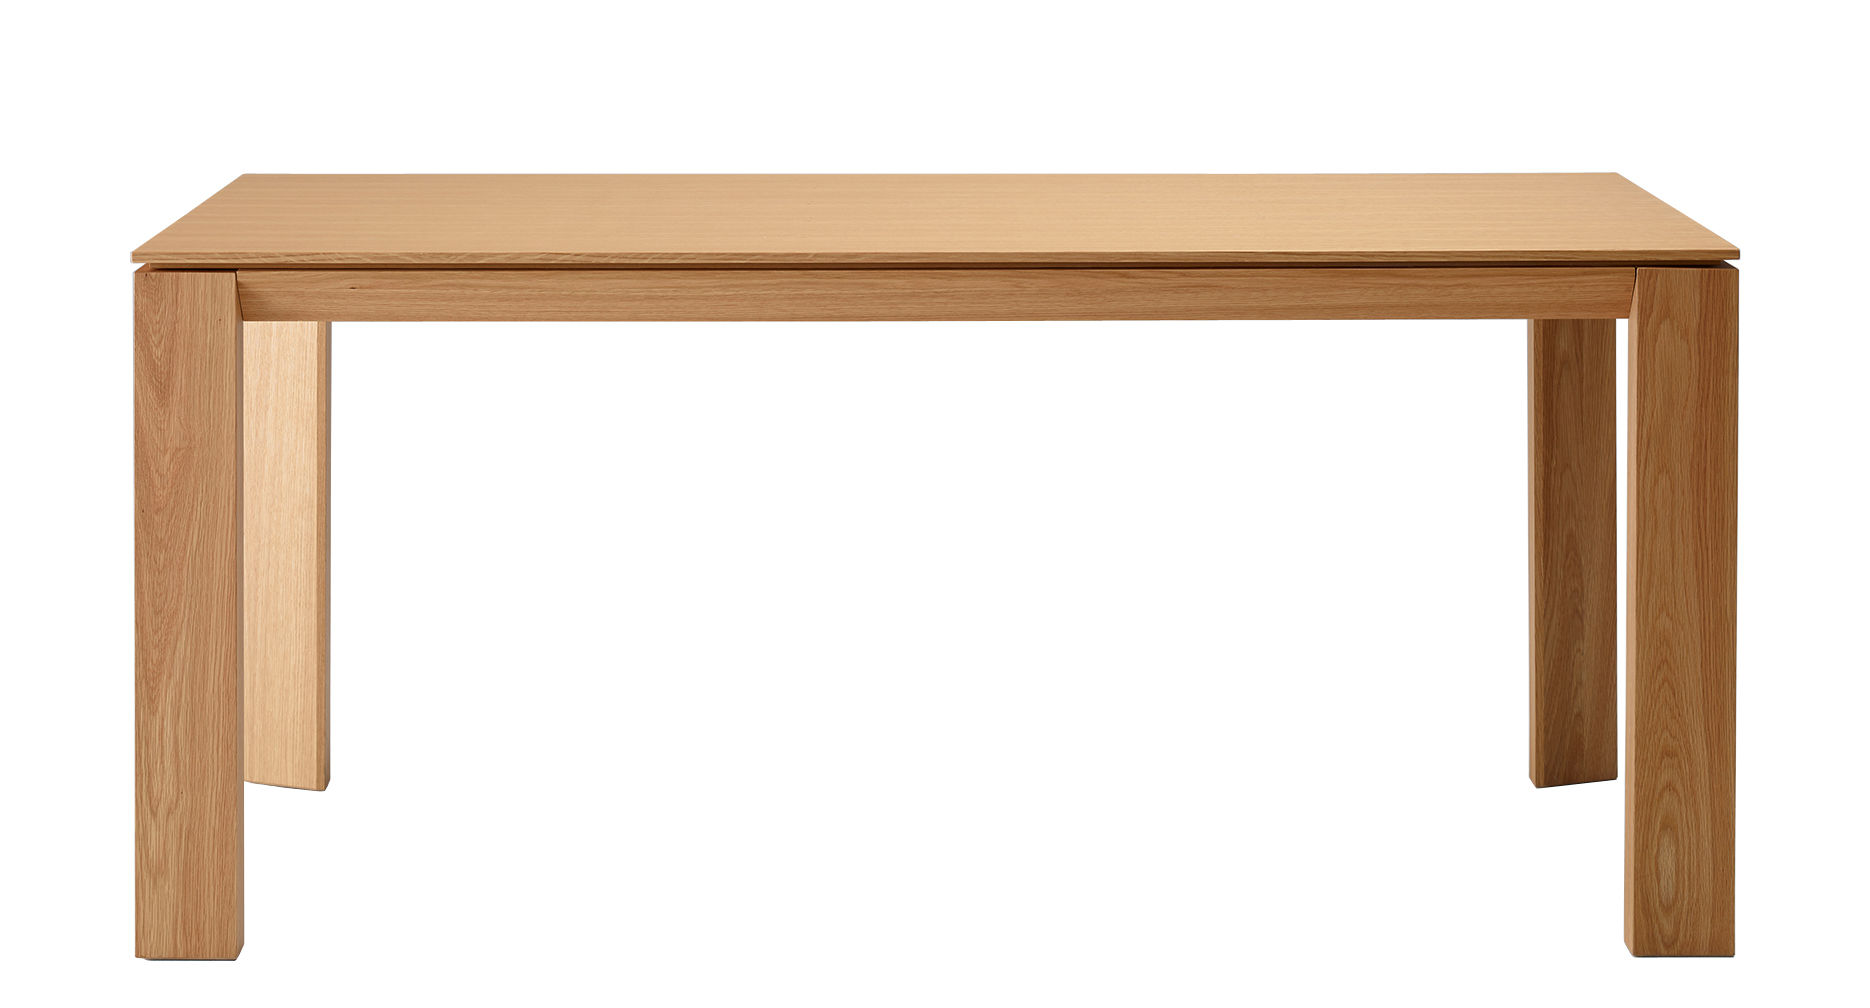 Tendances - À taaable ! - Table rectangulaire Iru / 180 x 100 cm - Ondarreta - Chêne naturel - Chêne massif